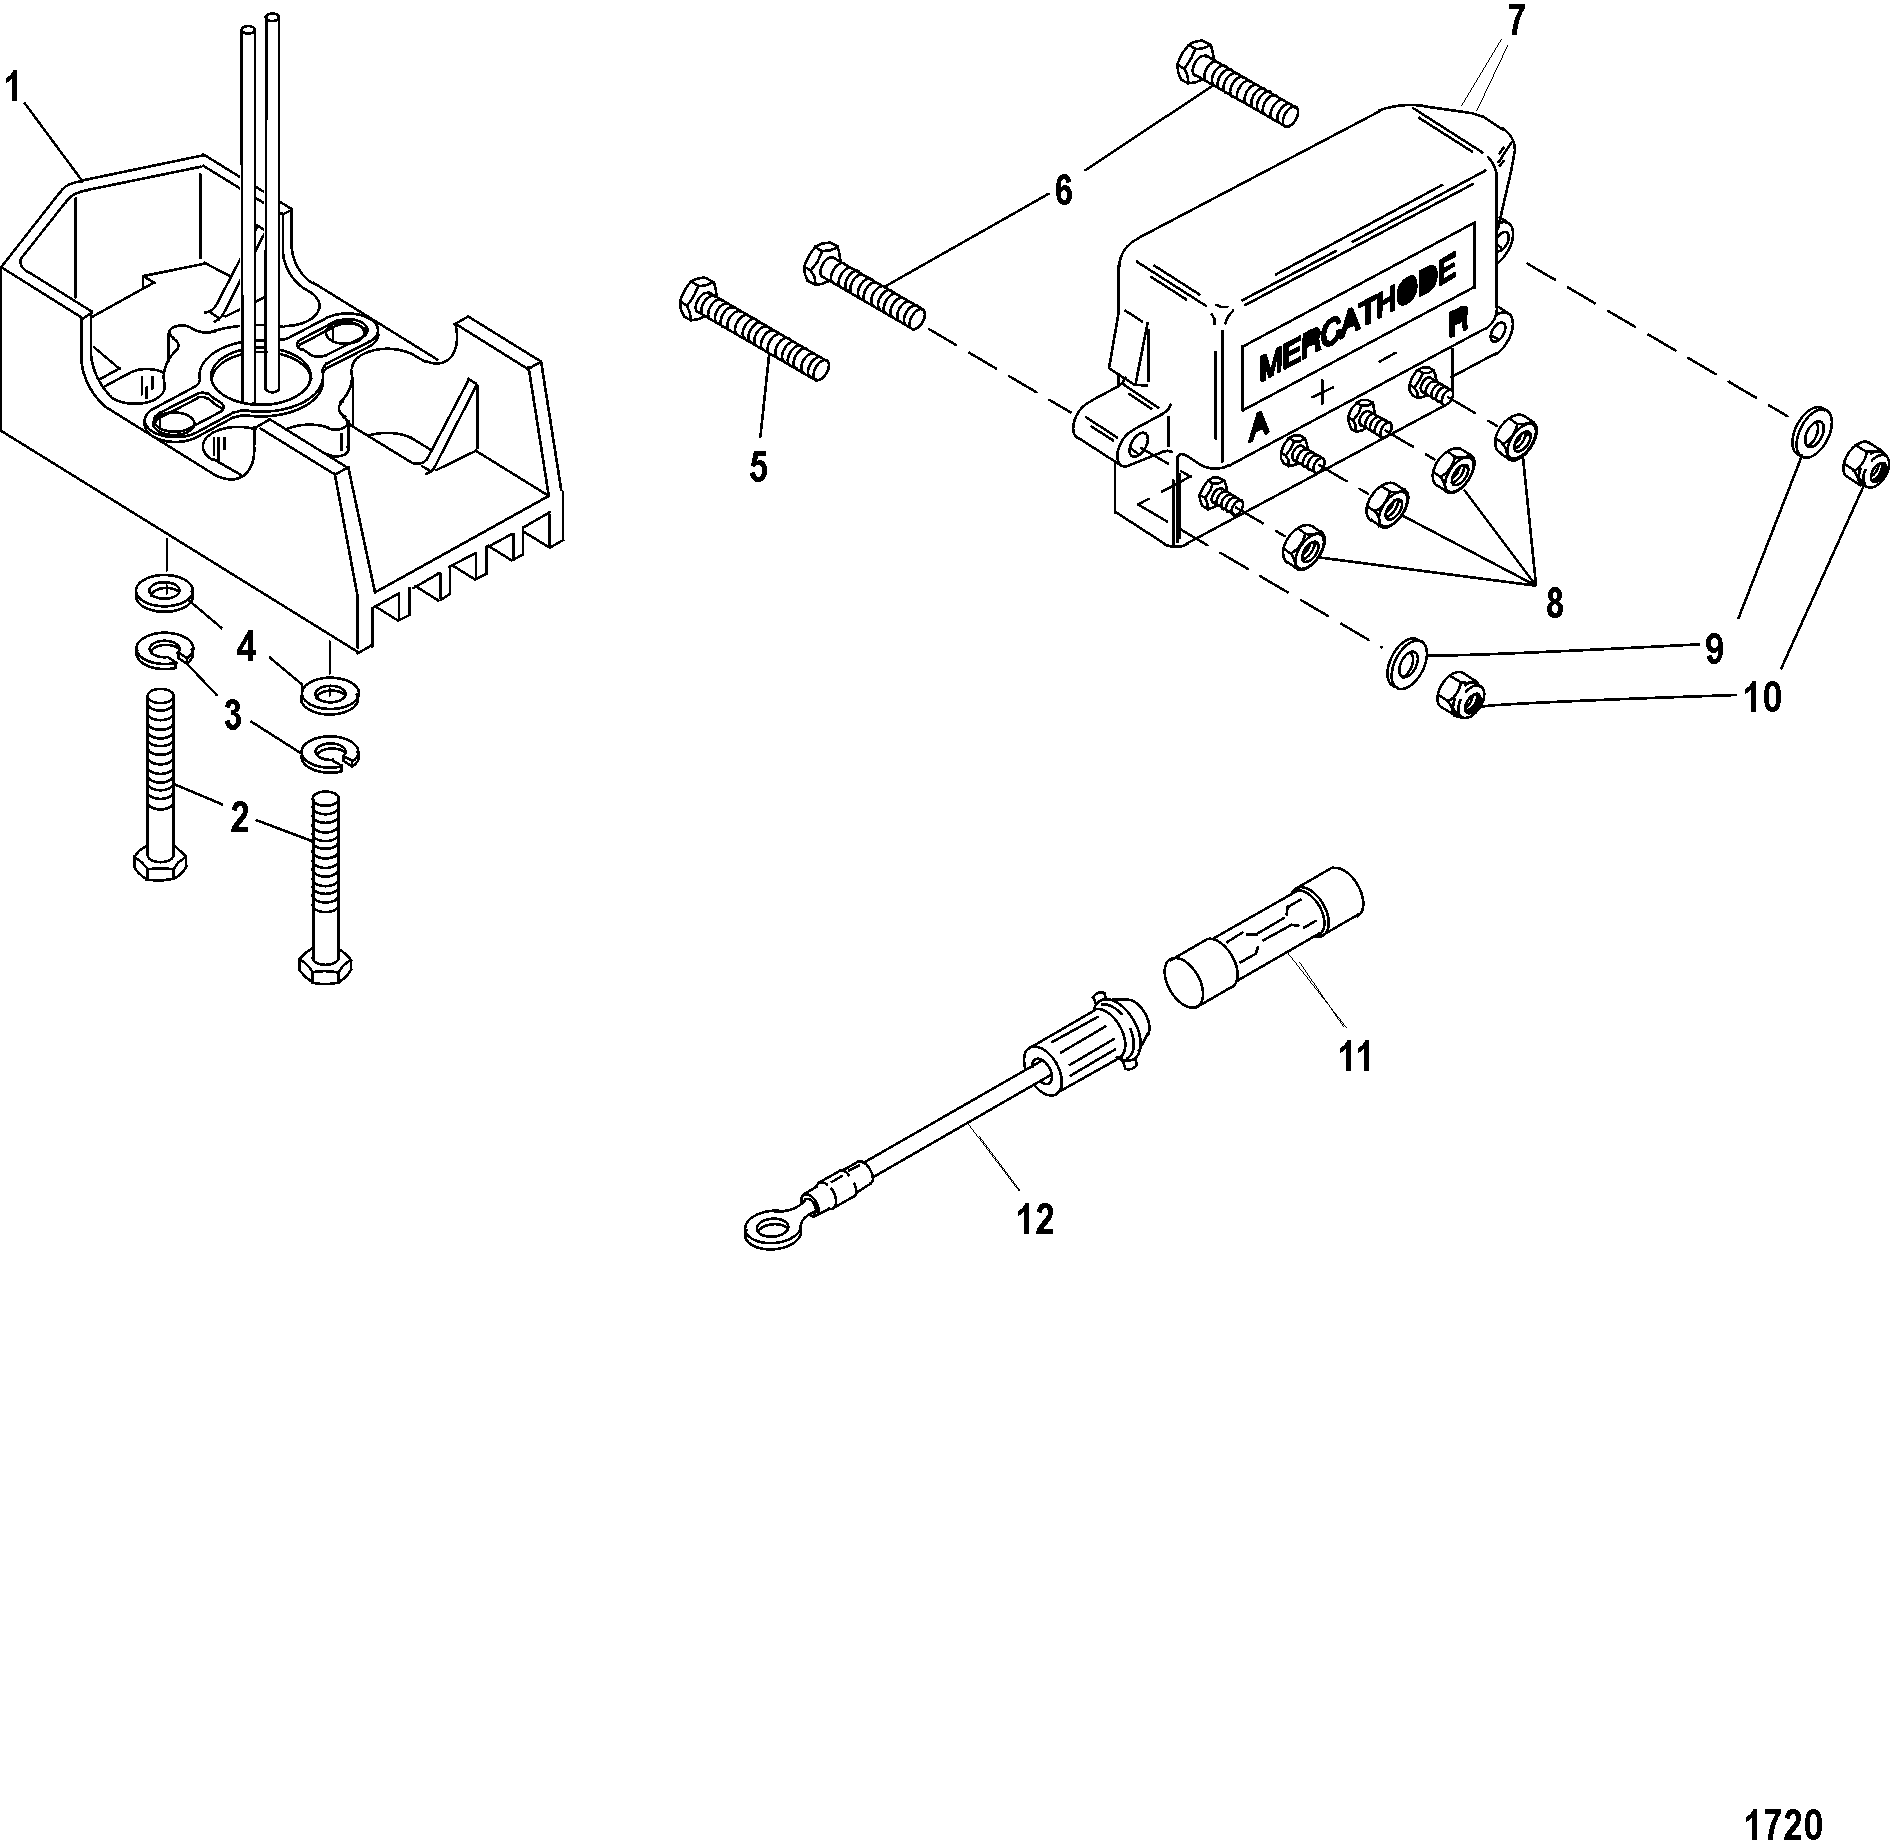 hight resolution of mercathode wiring diagram wiring diagrams scematic wiring diagram fuel pump on 4 3lx mercruiser cp